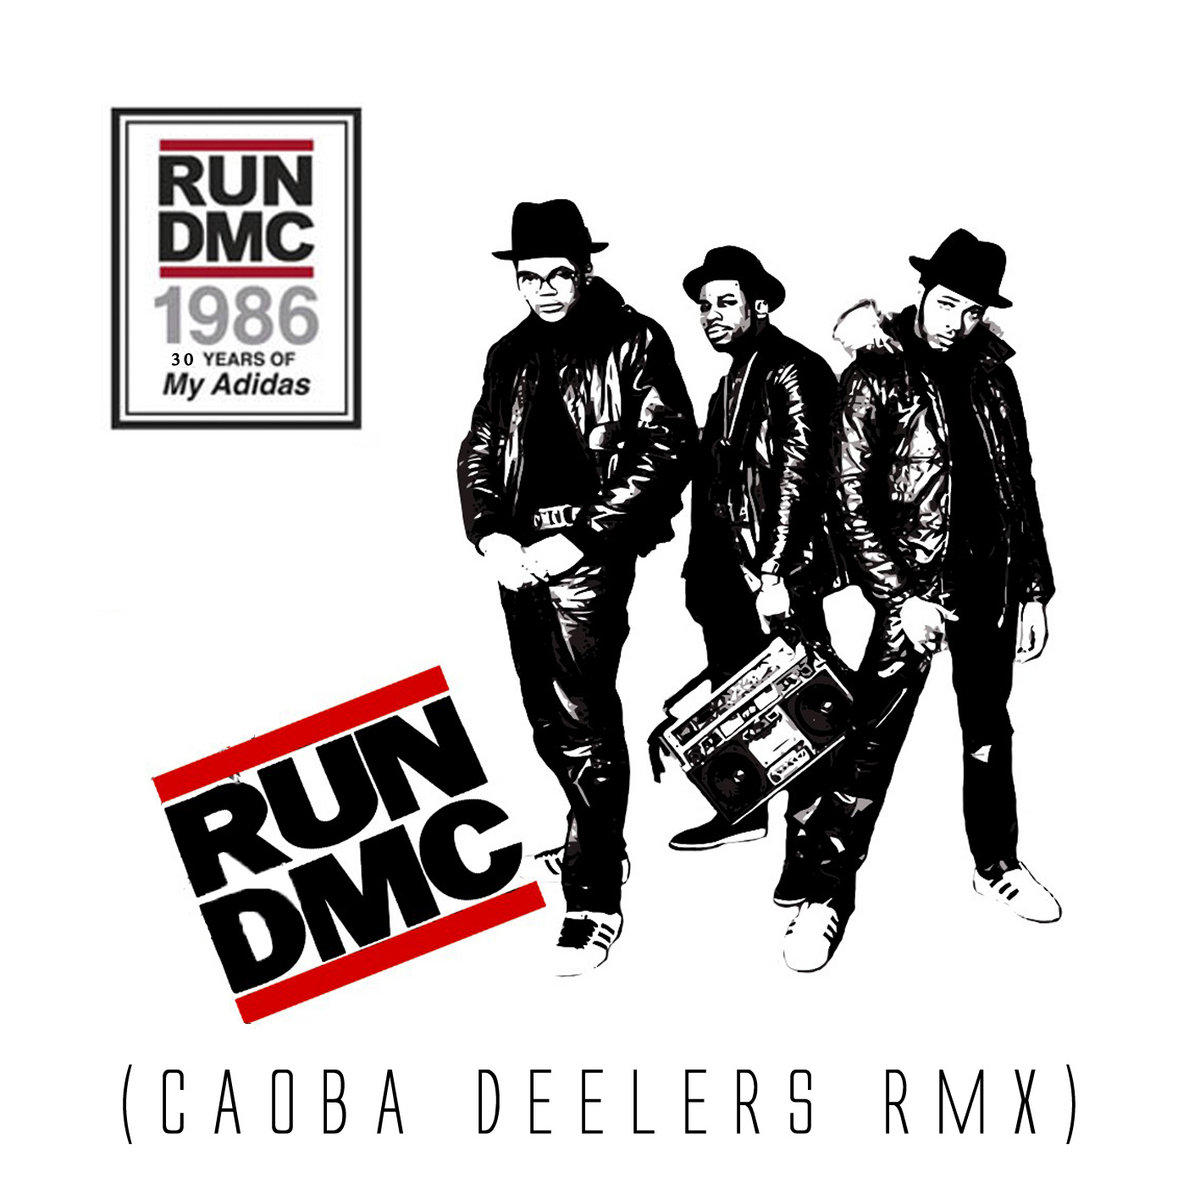 super mignon 56723 87073 Run DMC - My Adidas (Caoba Deelers RMX)   Caoba Deelers